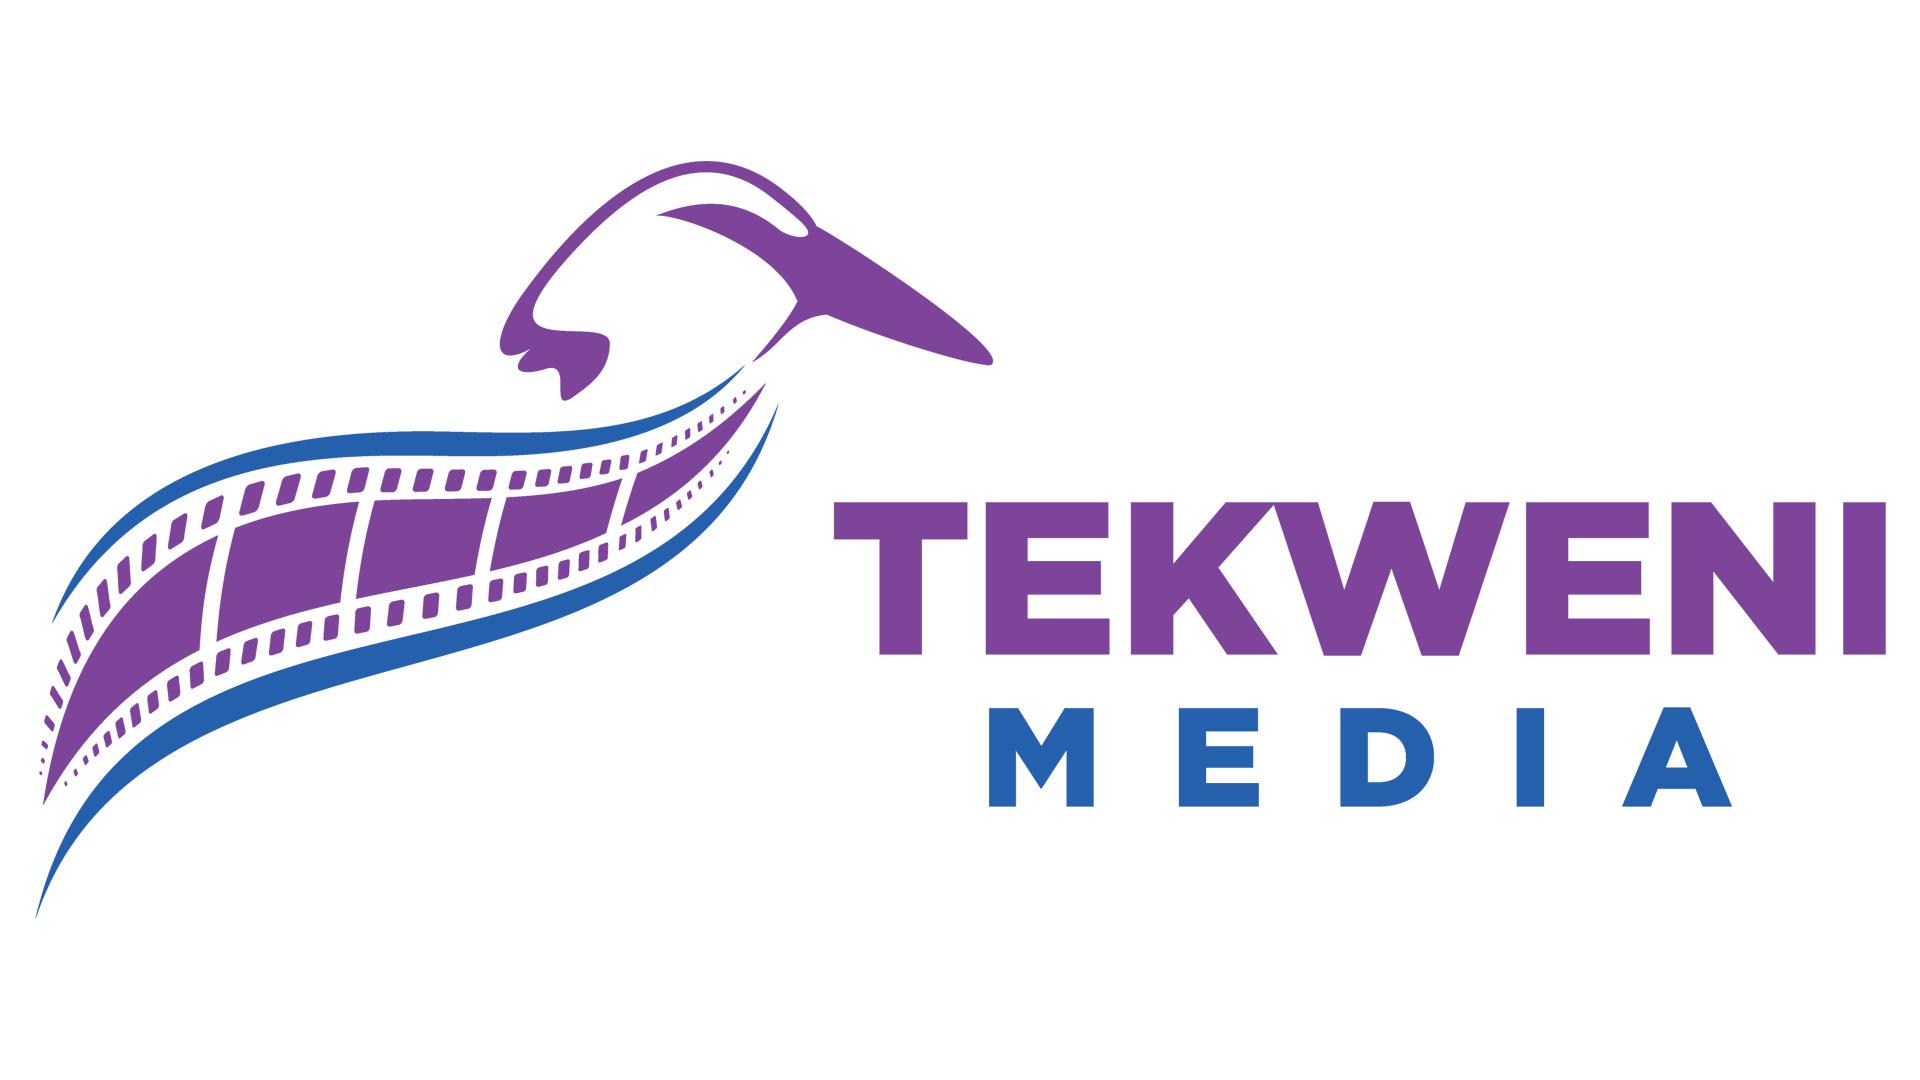 Tekweni Media